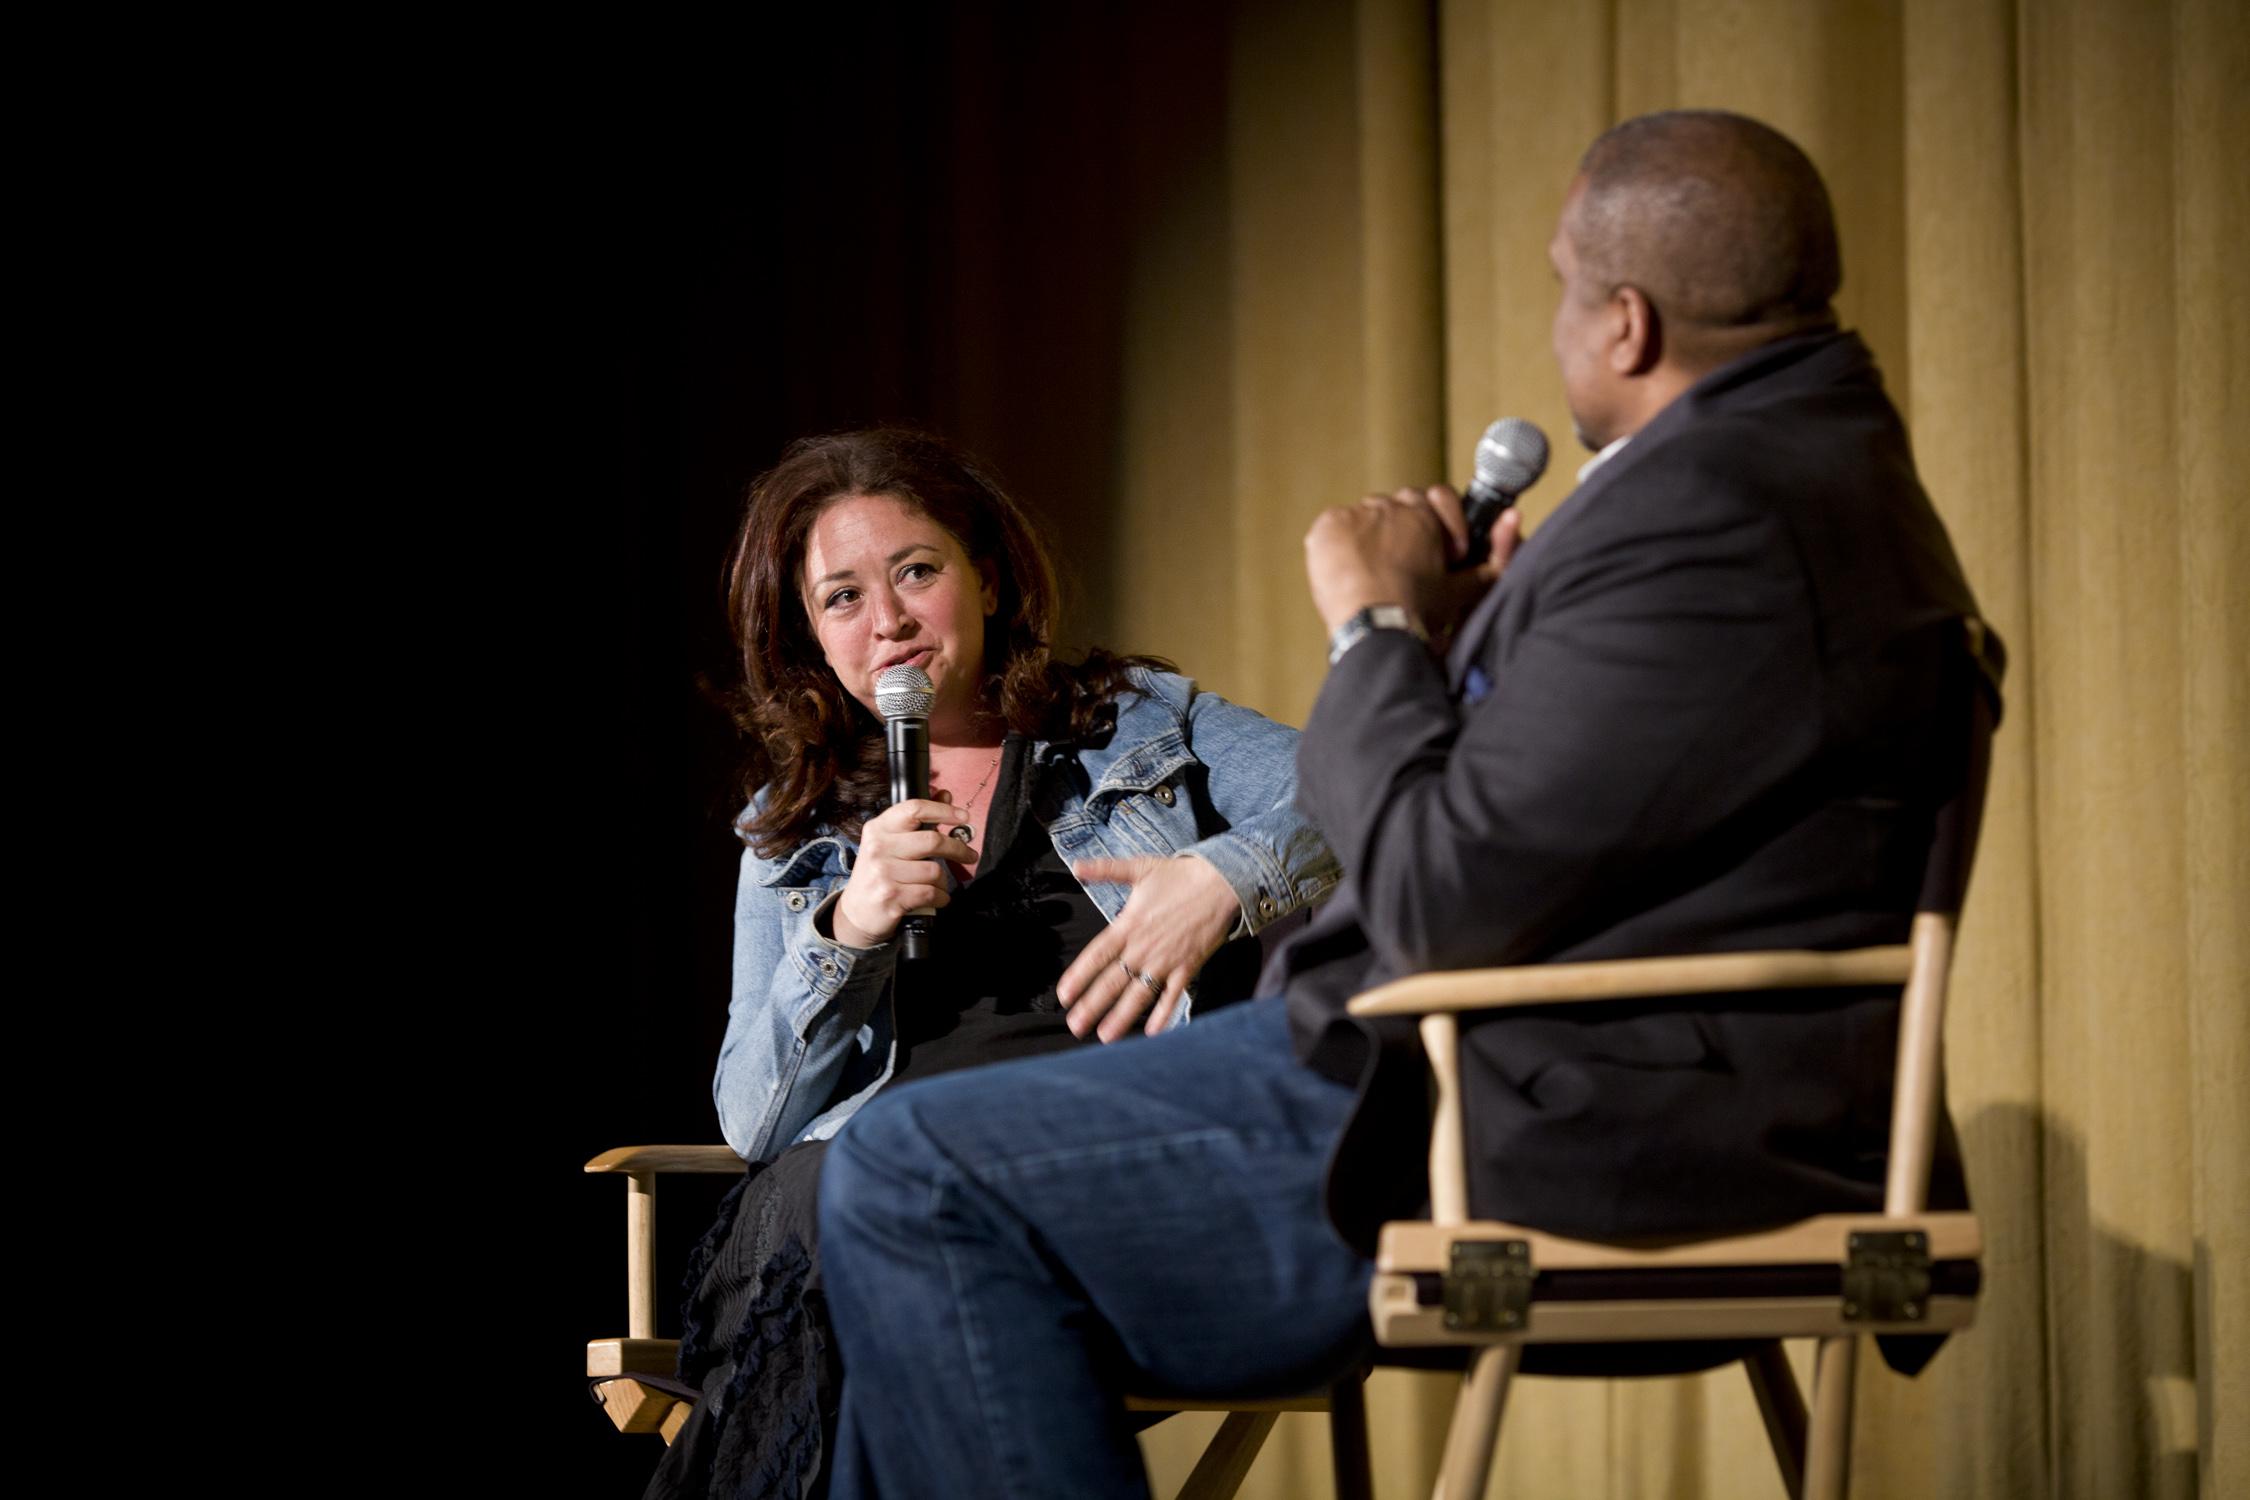 Liz Garbus & Tavis Smiley onstage